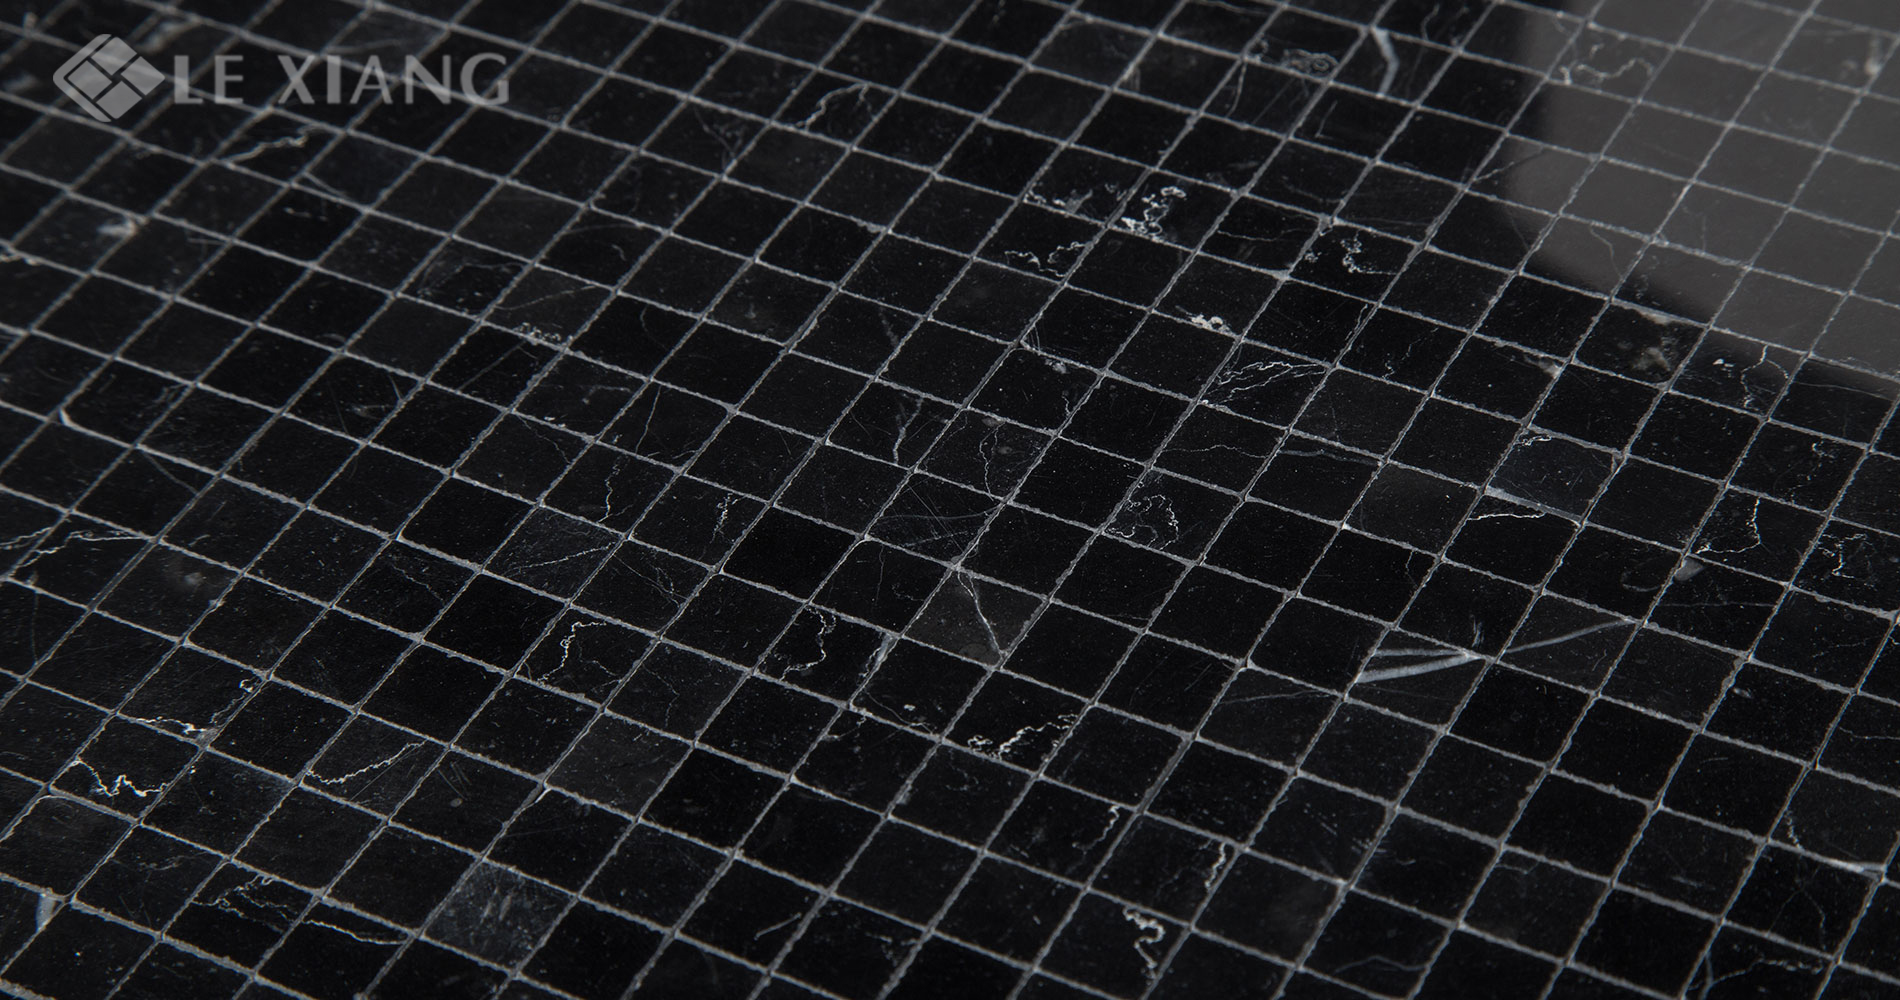 Square-Mable-Mosaic-Tiles-For-Kitchen-Backsplash-12